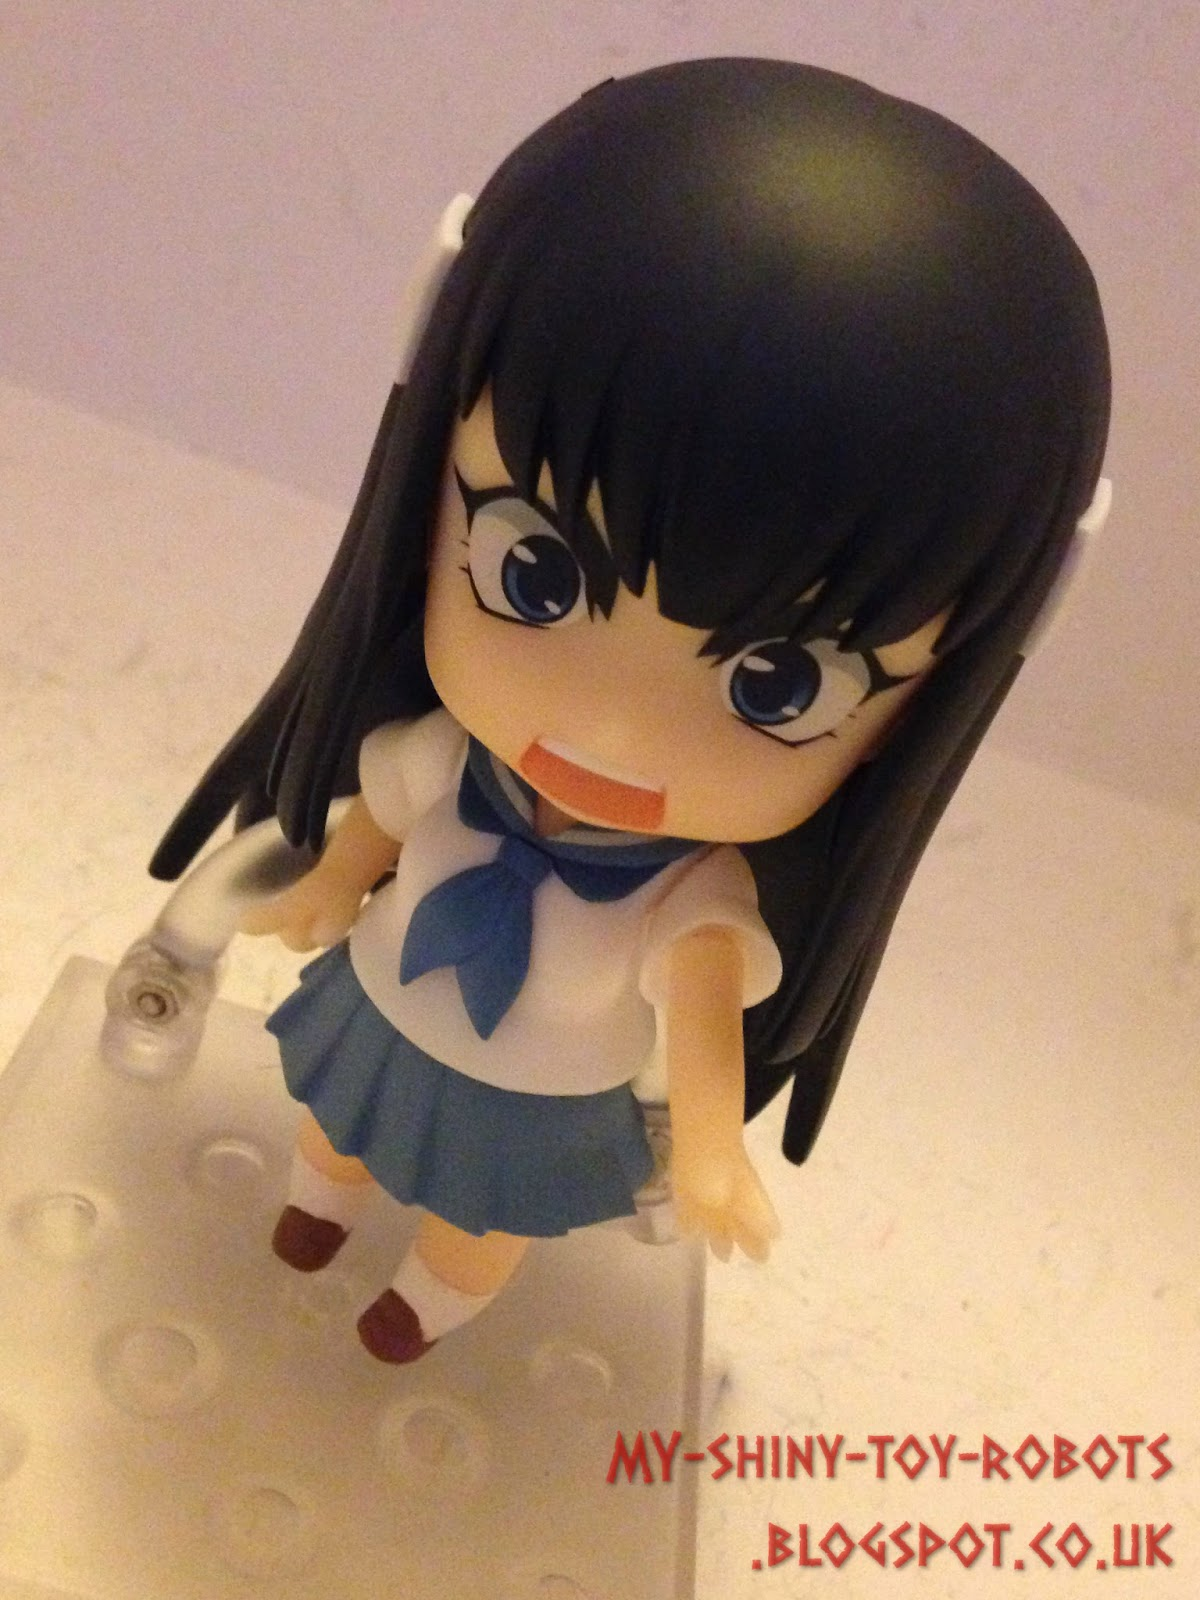 Satsuki with Mako's body